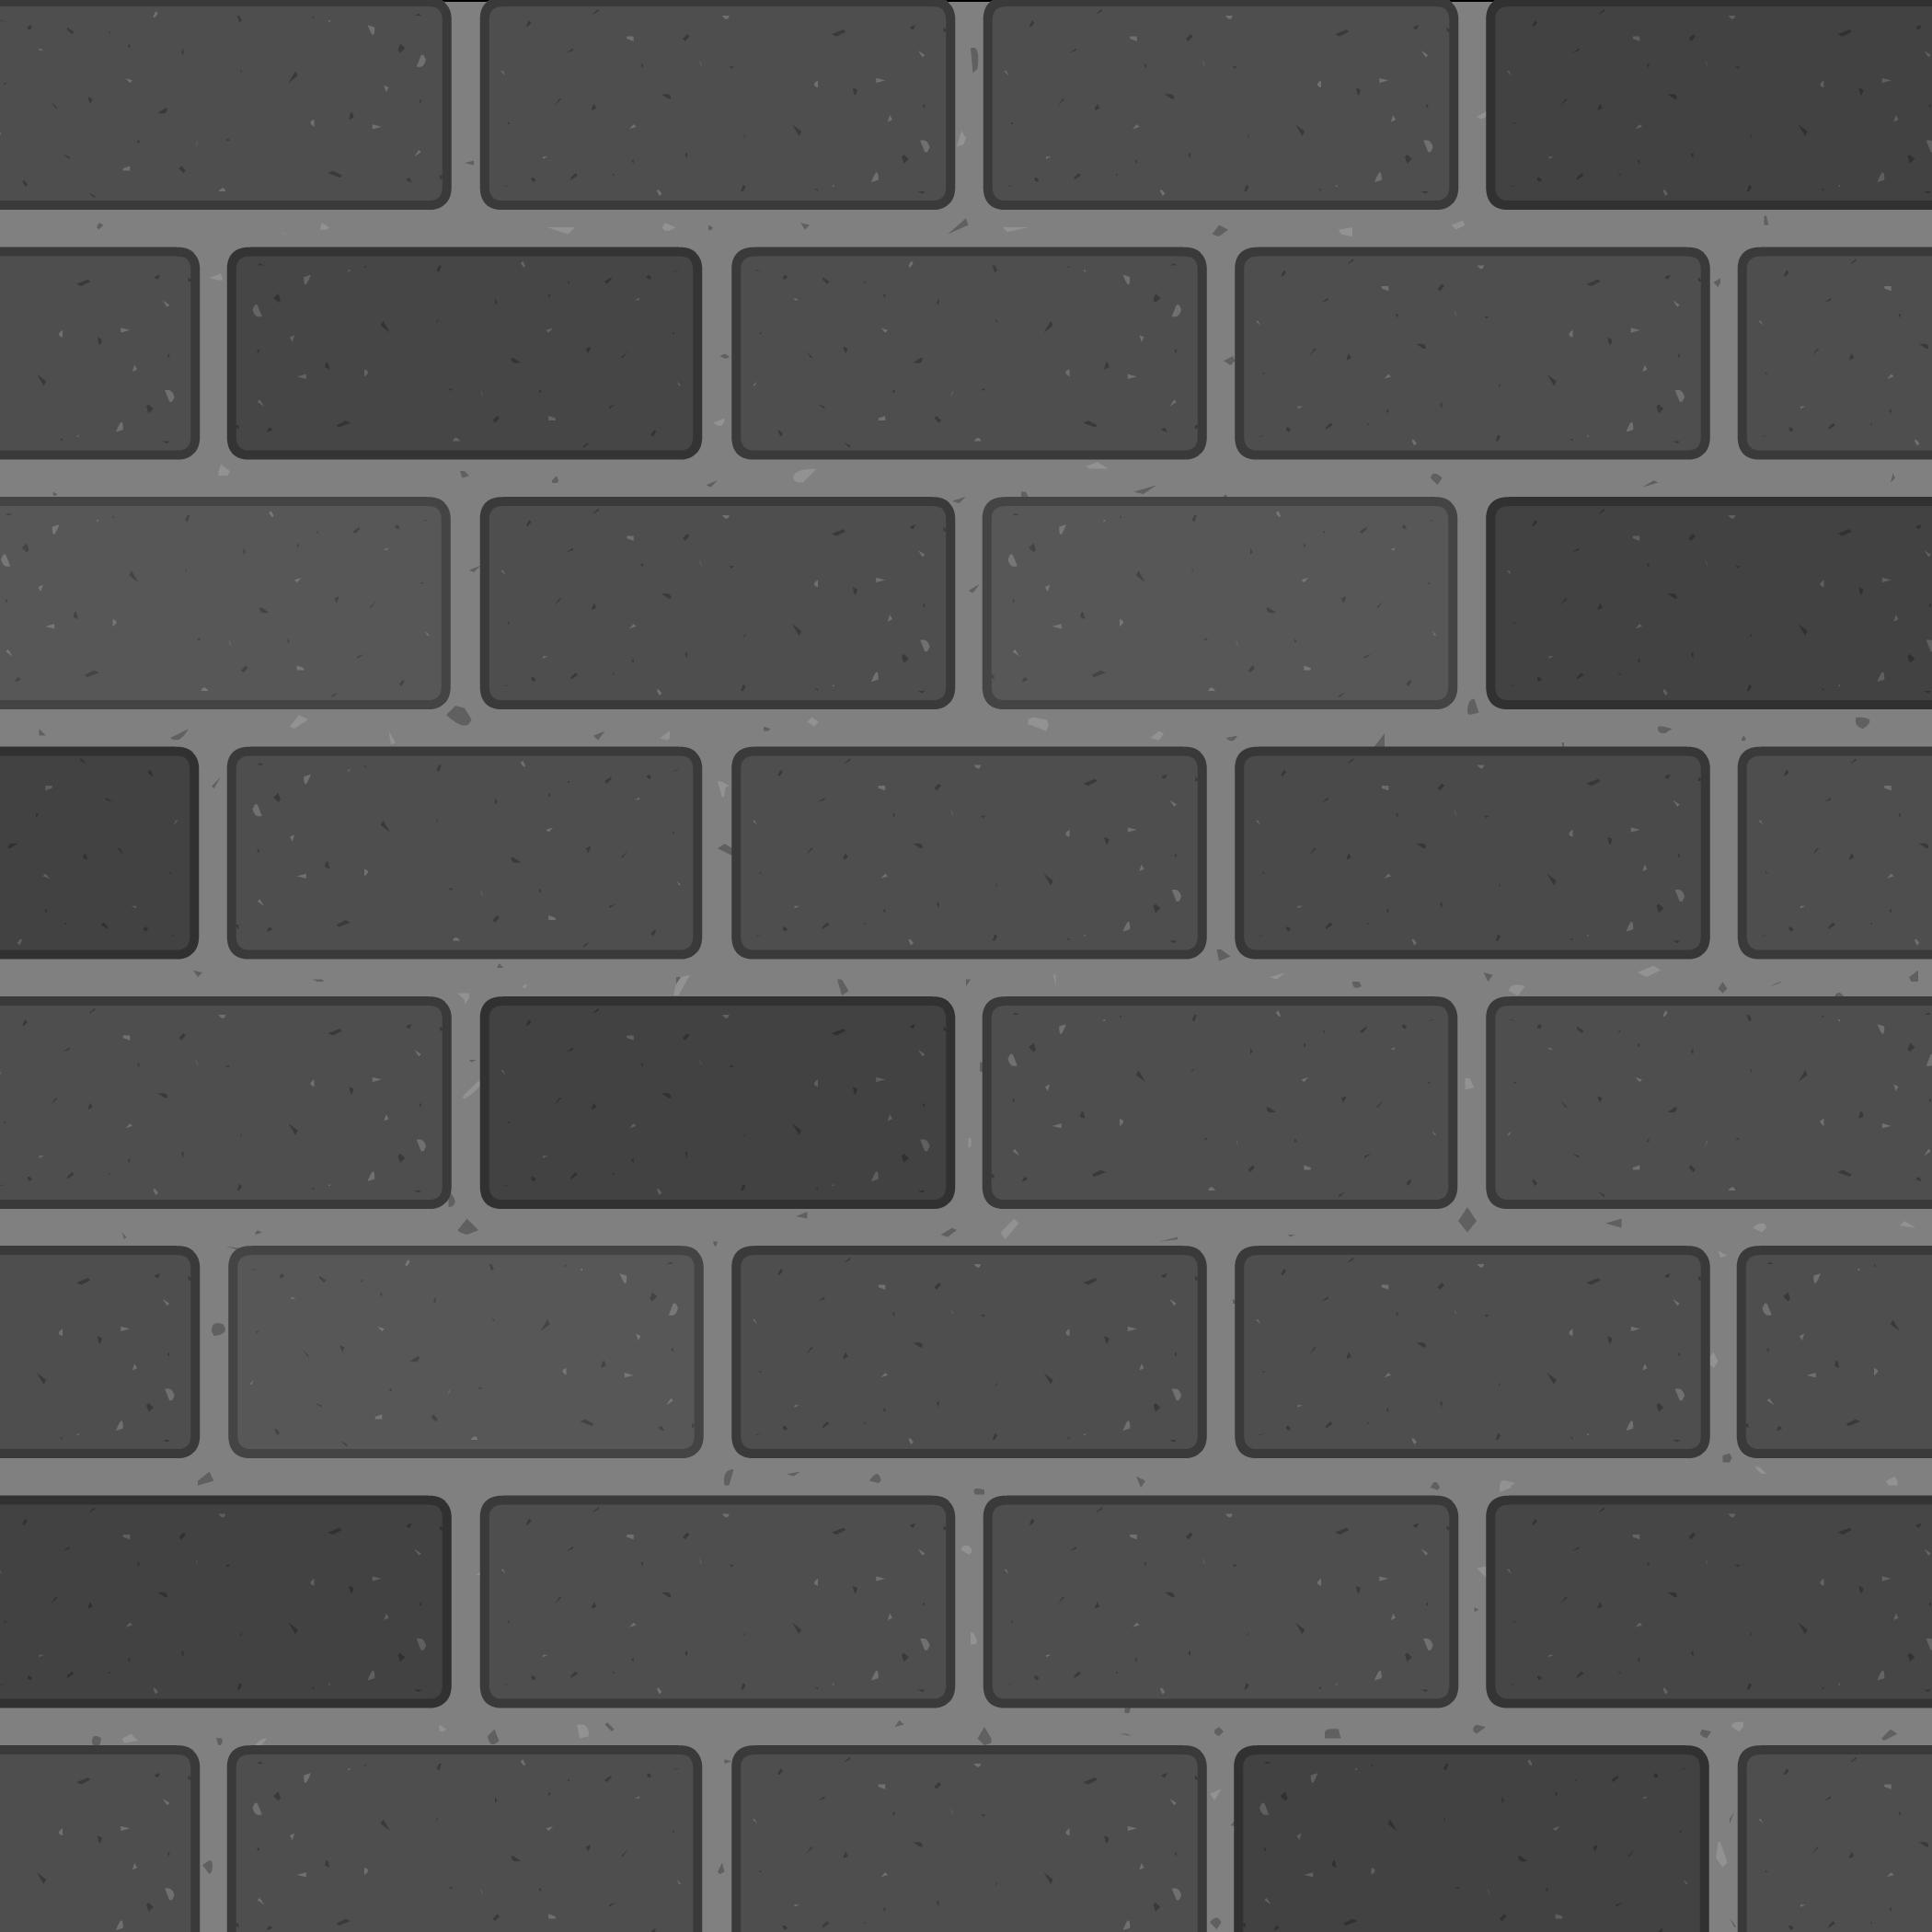 Black and White Brick Background